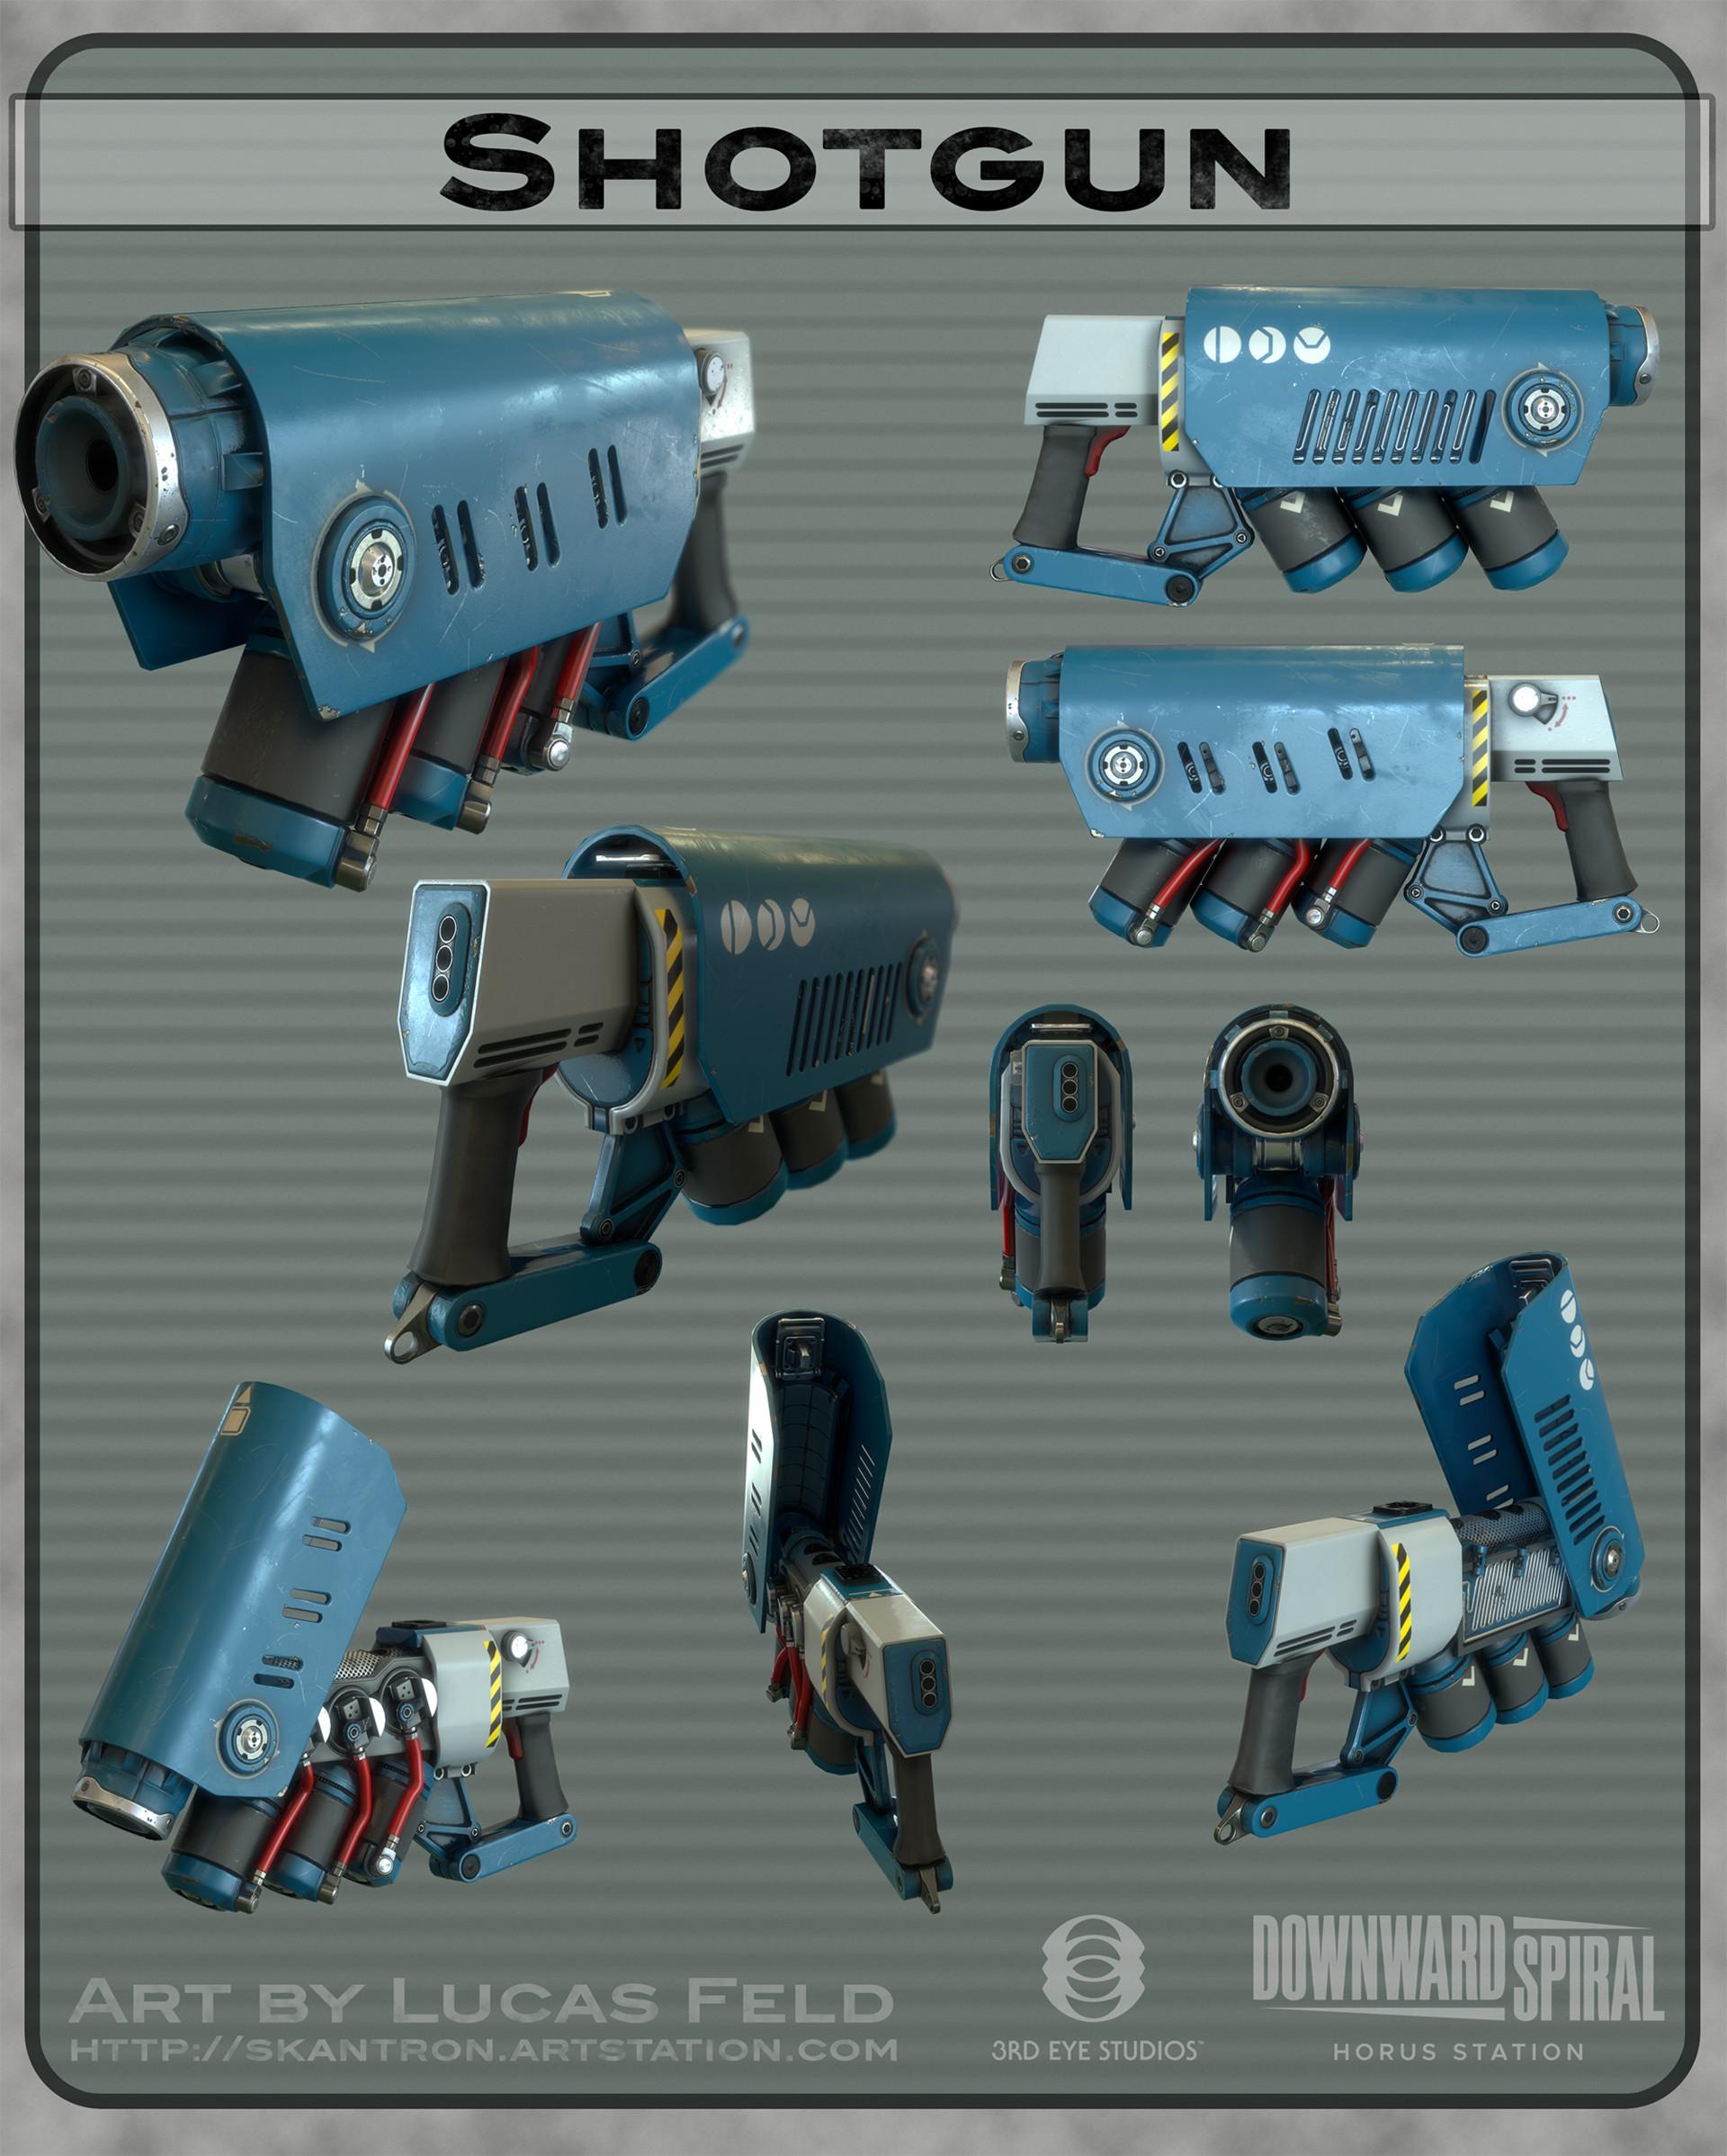 Lucas feld weaponsprex shotgun